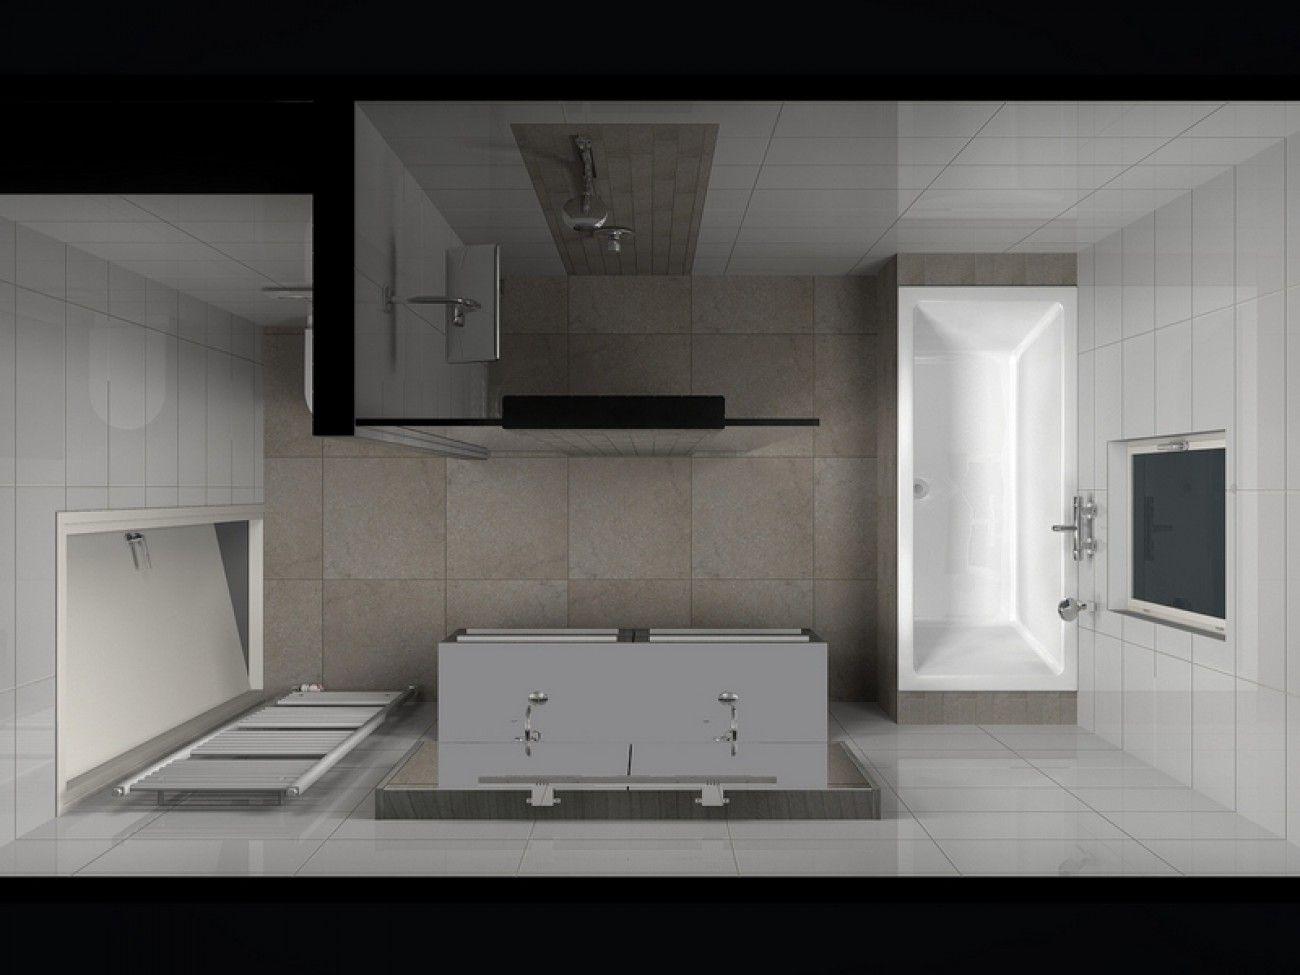 Badkamer idee voor kleine badkamer | home stuff | Pinterest ...